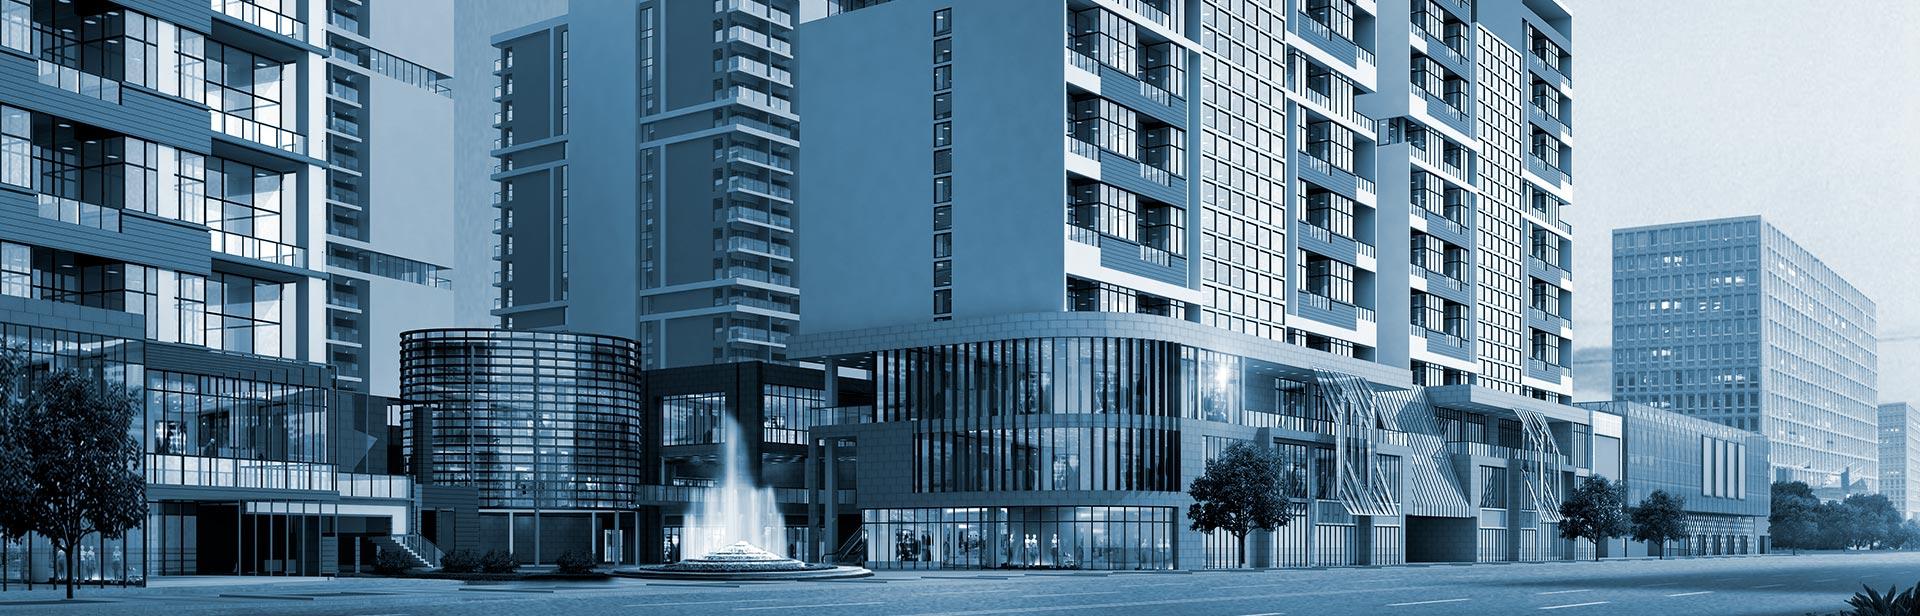 slider projet location immobilier